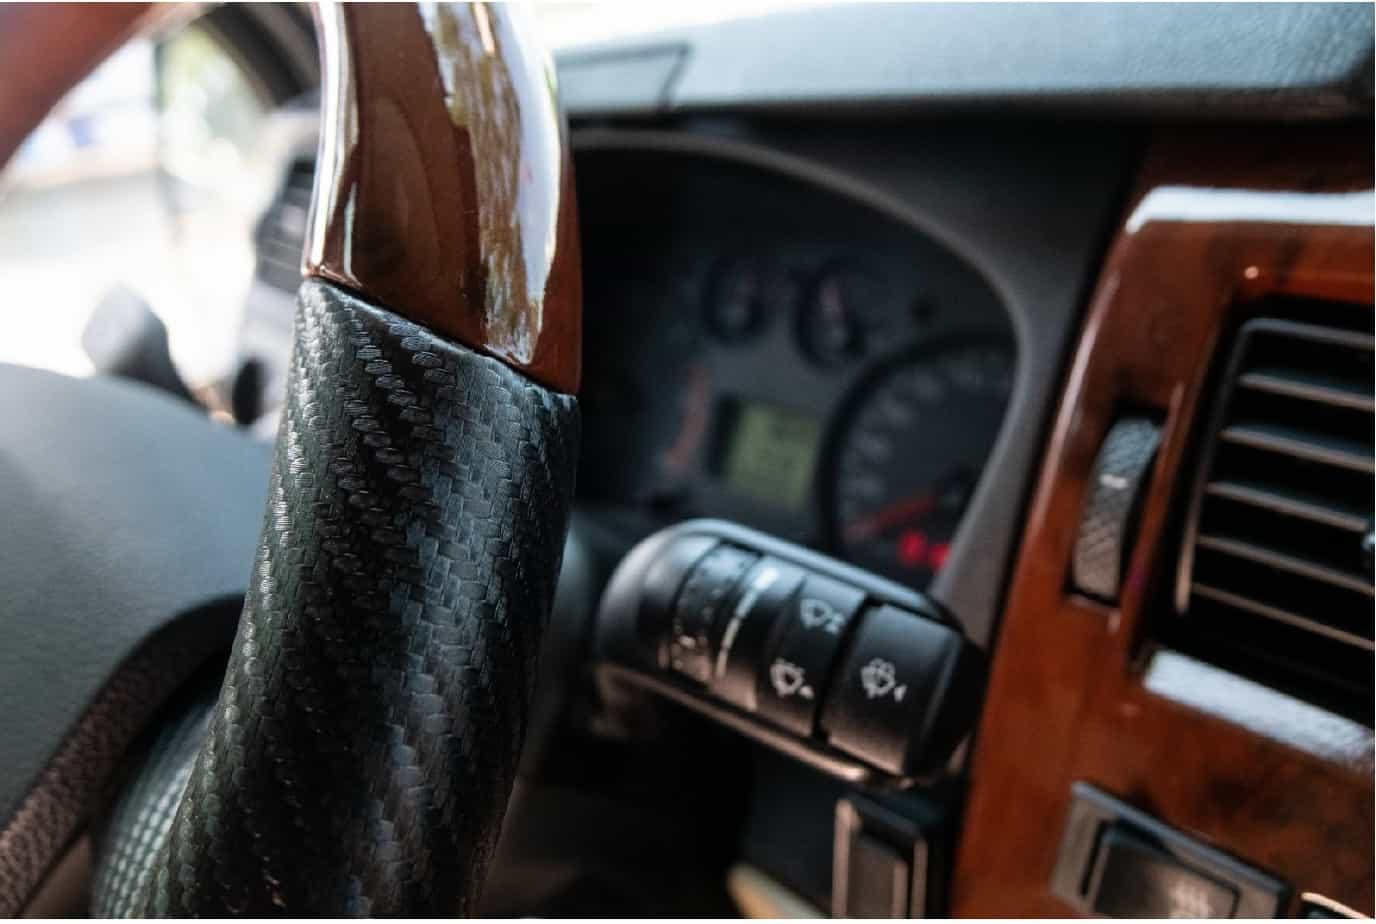 Xe Ford Transit 10 chỗ City Limousine cao cấp kèm giá bán hấp dẫn 39